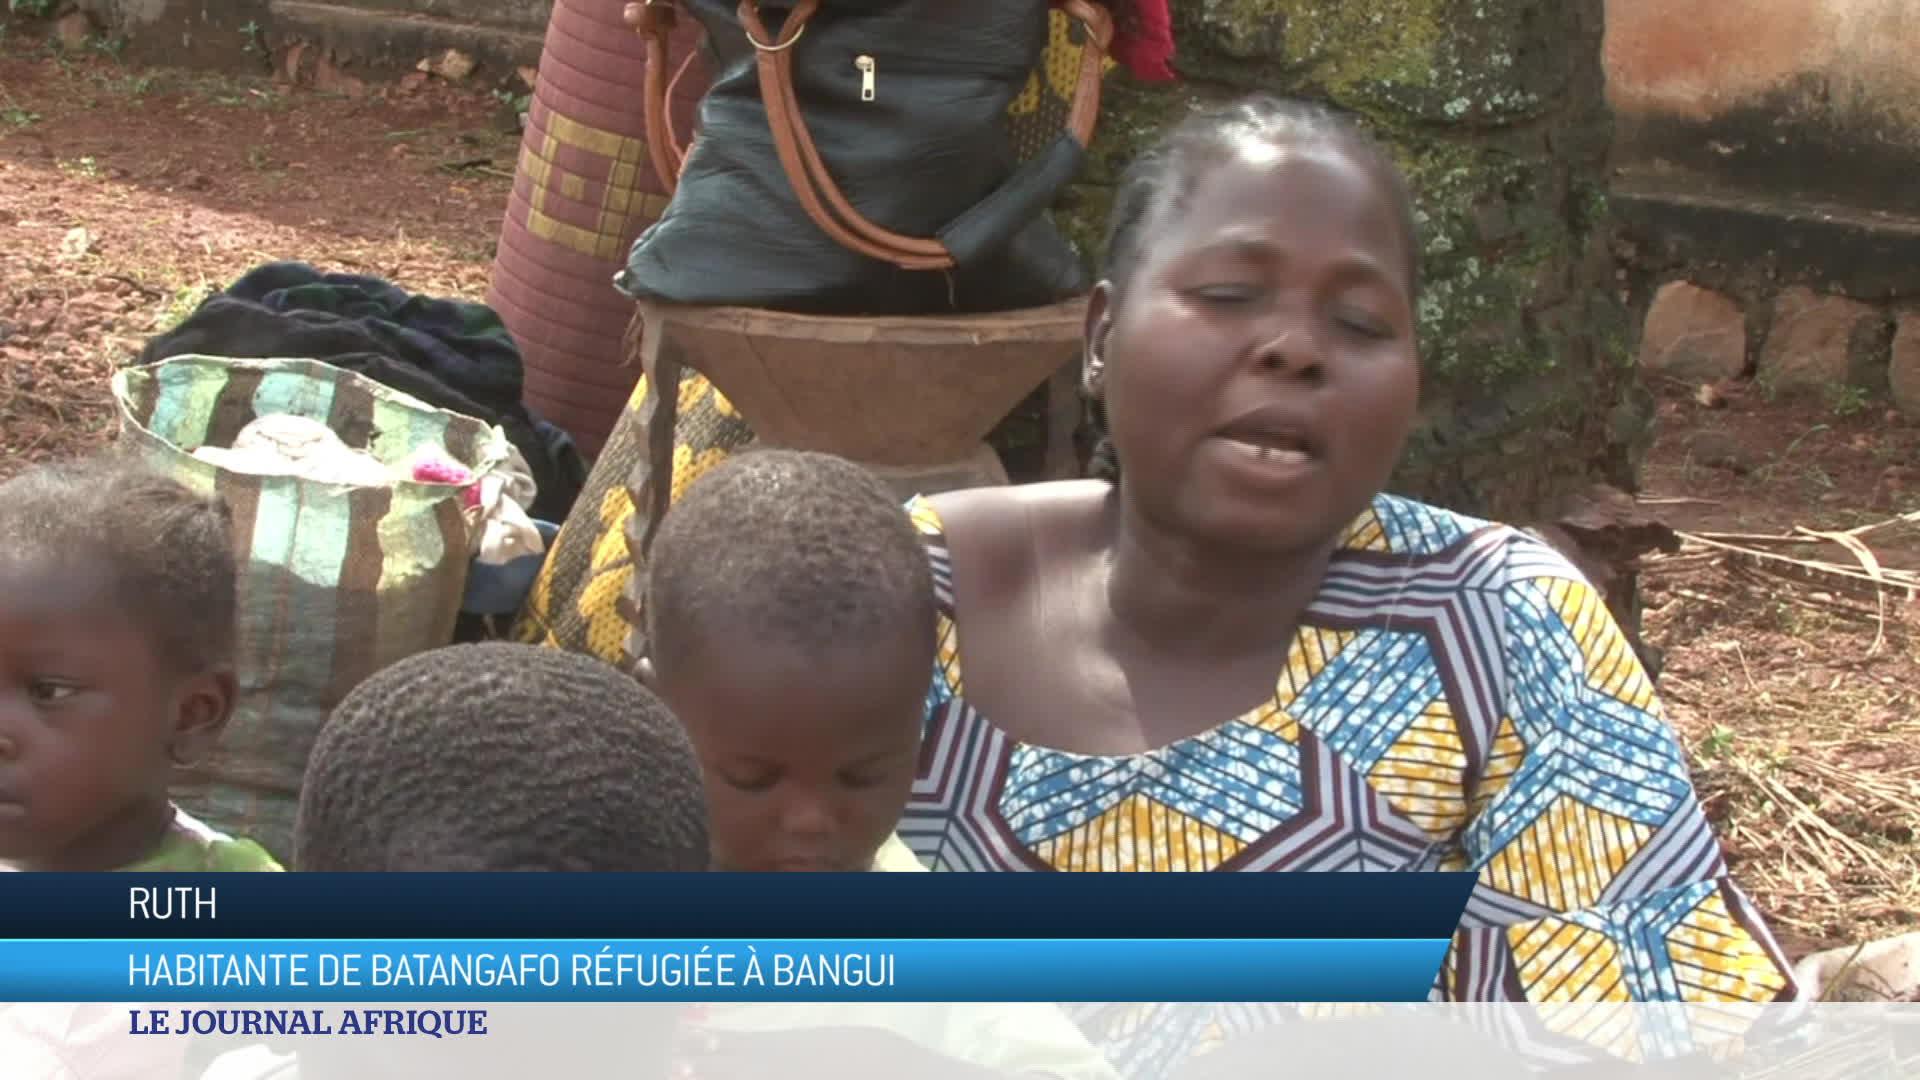 Le cycle de la violence perdure en Centrafrique